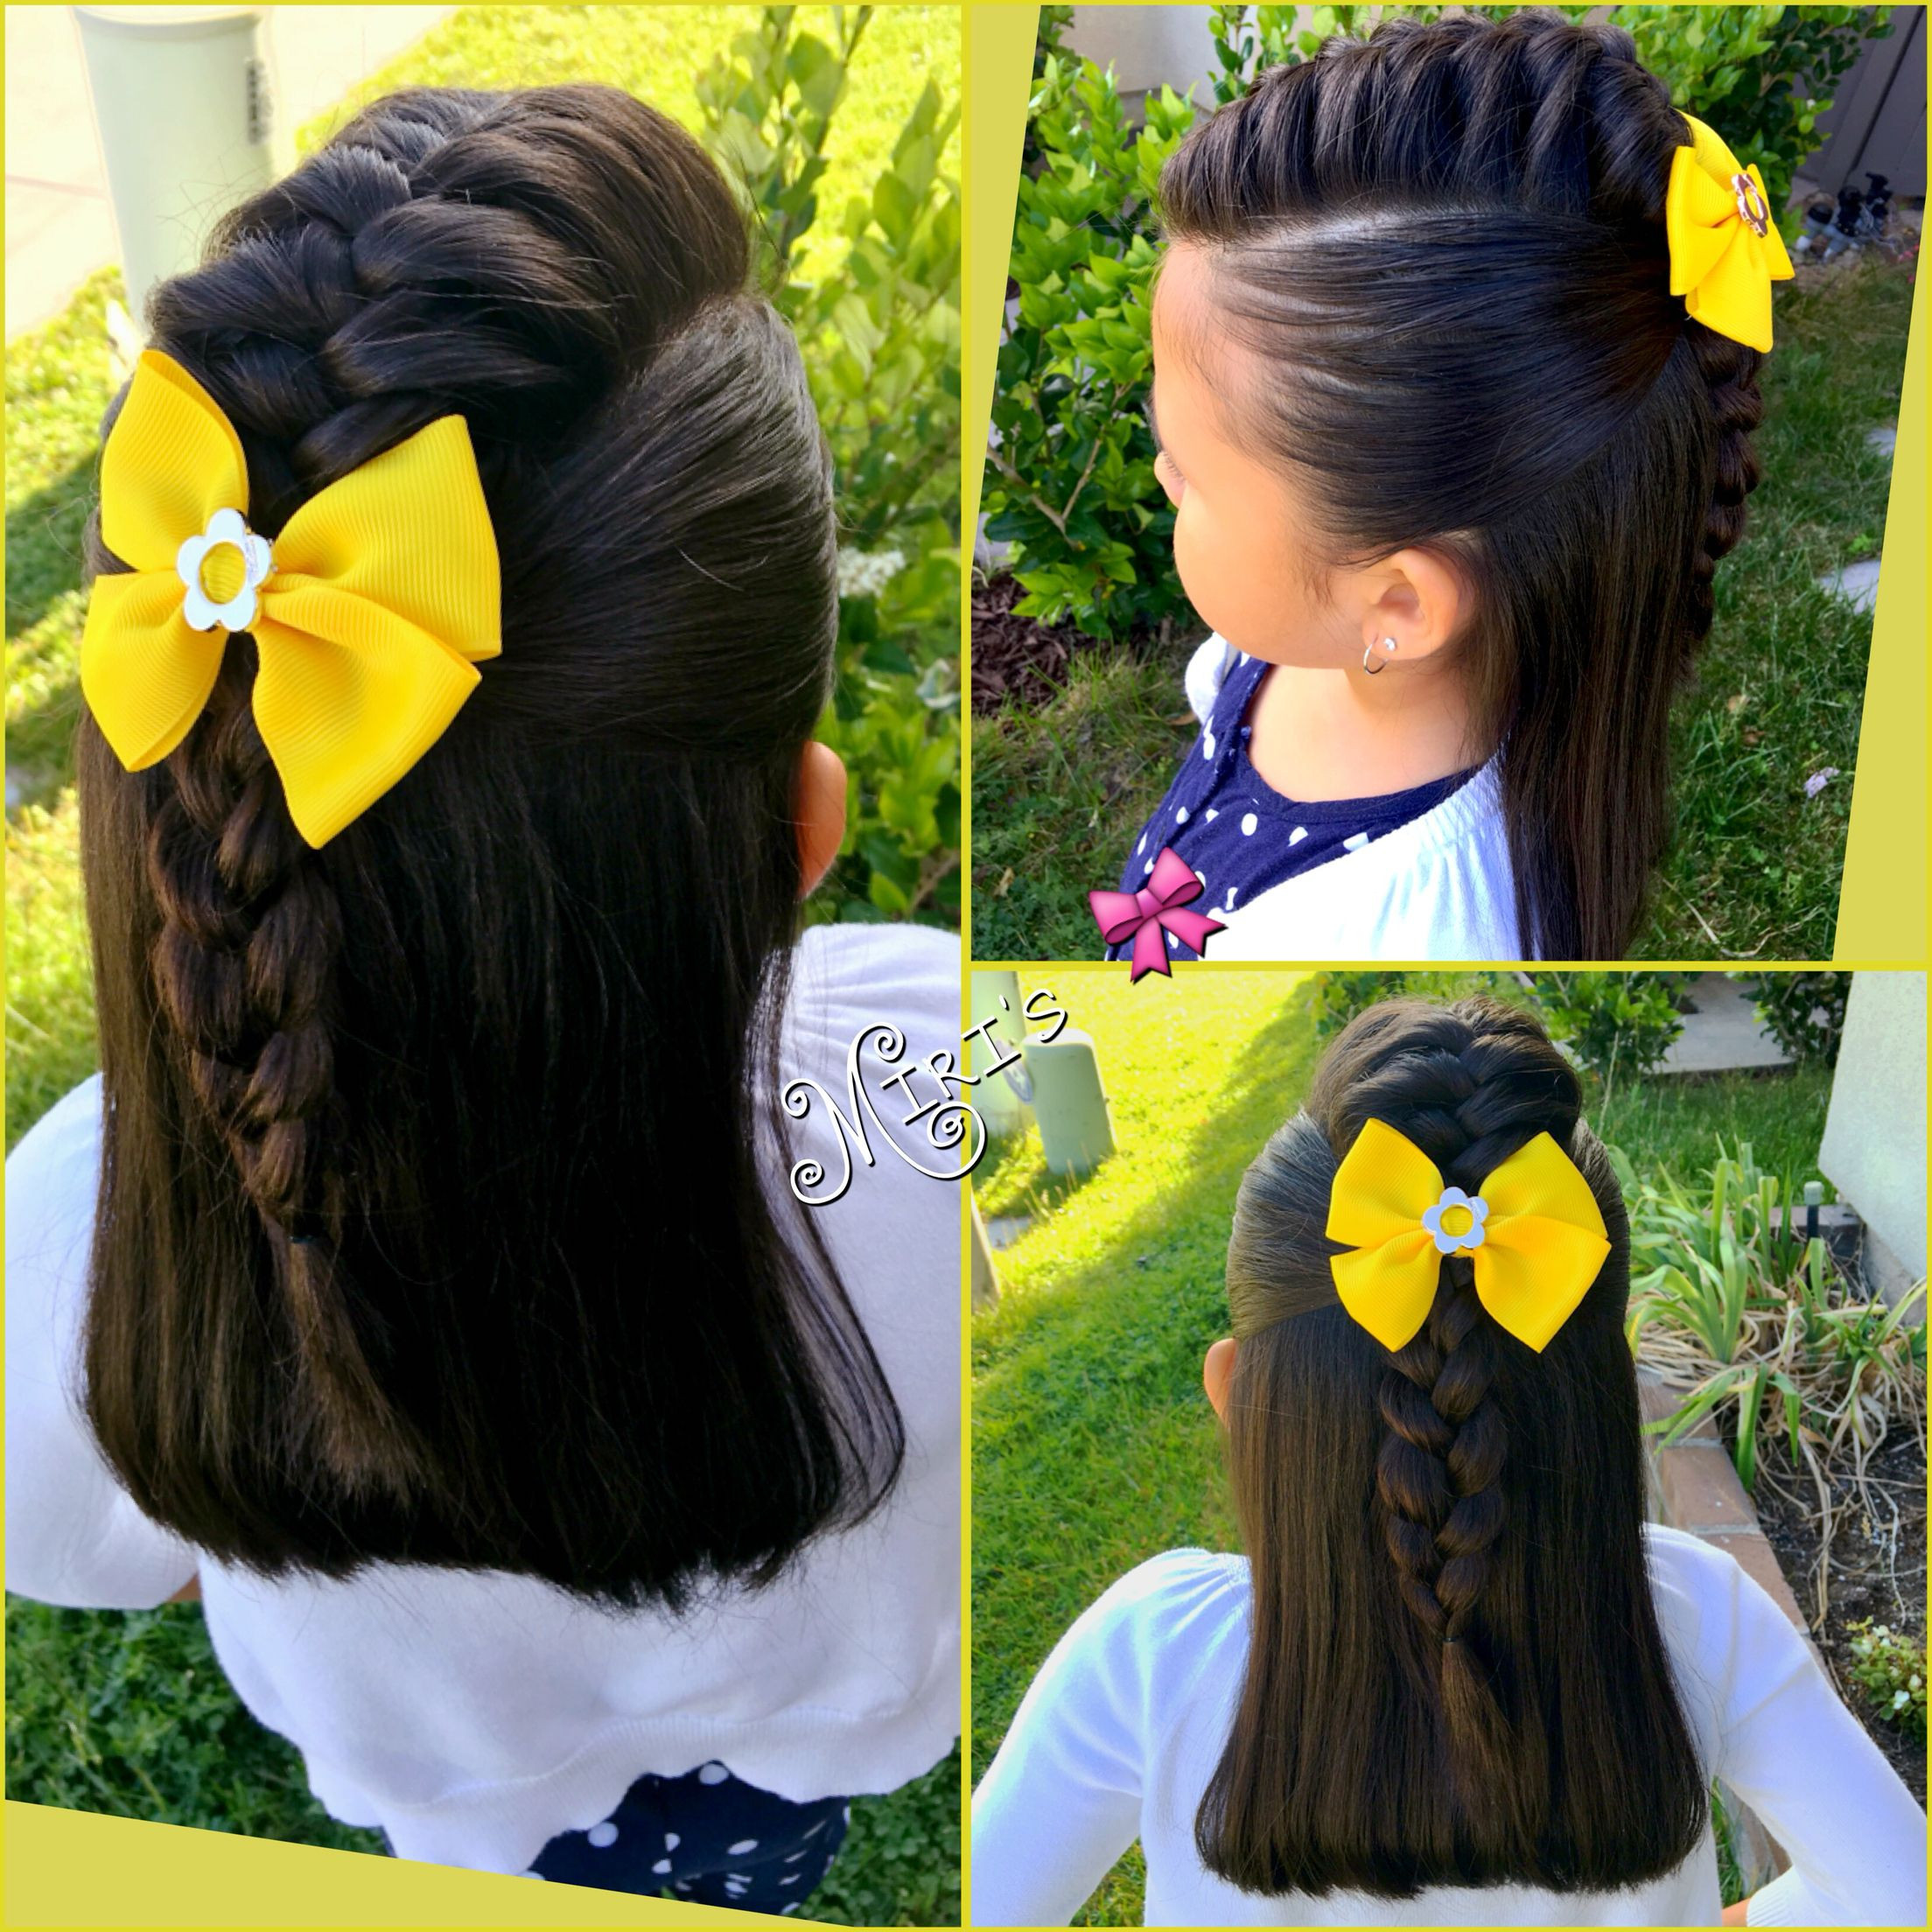 Mohawk Hairstyle For Little Girls  Mohawk hair style for little girls